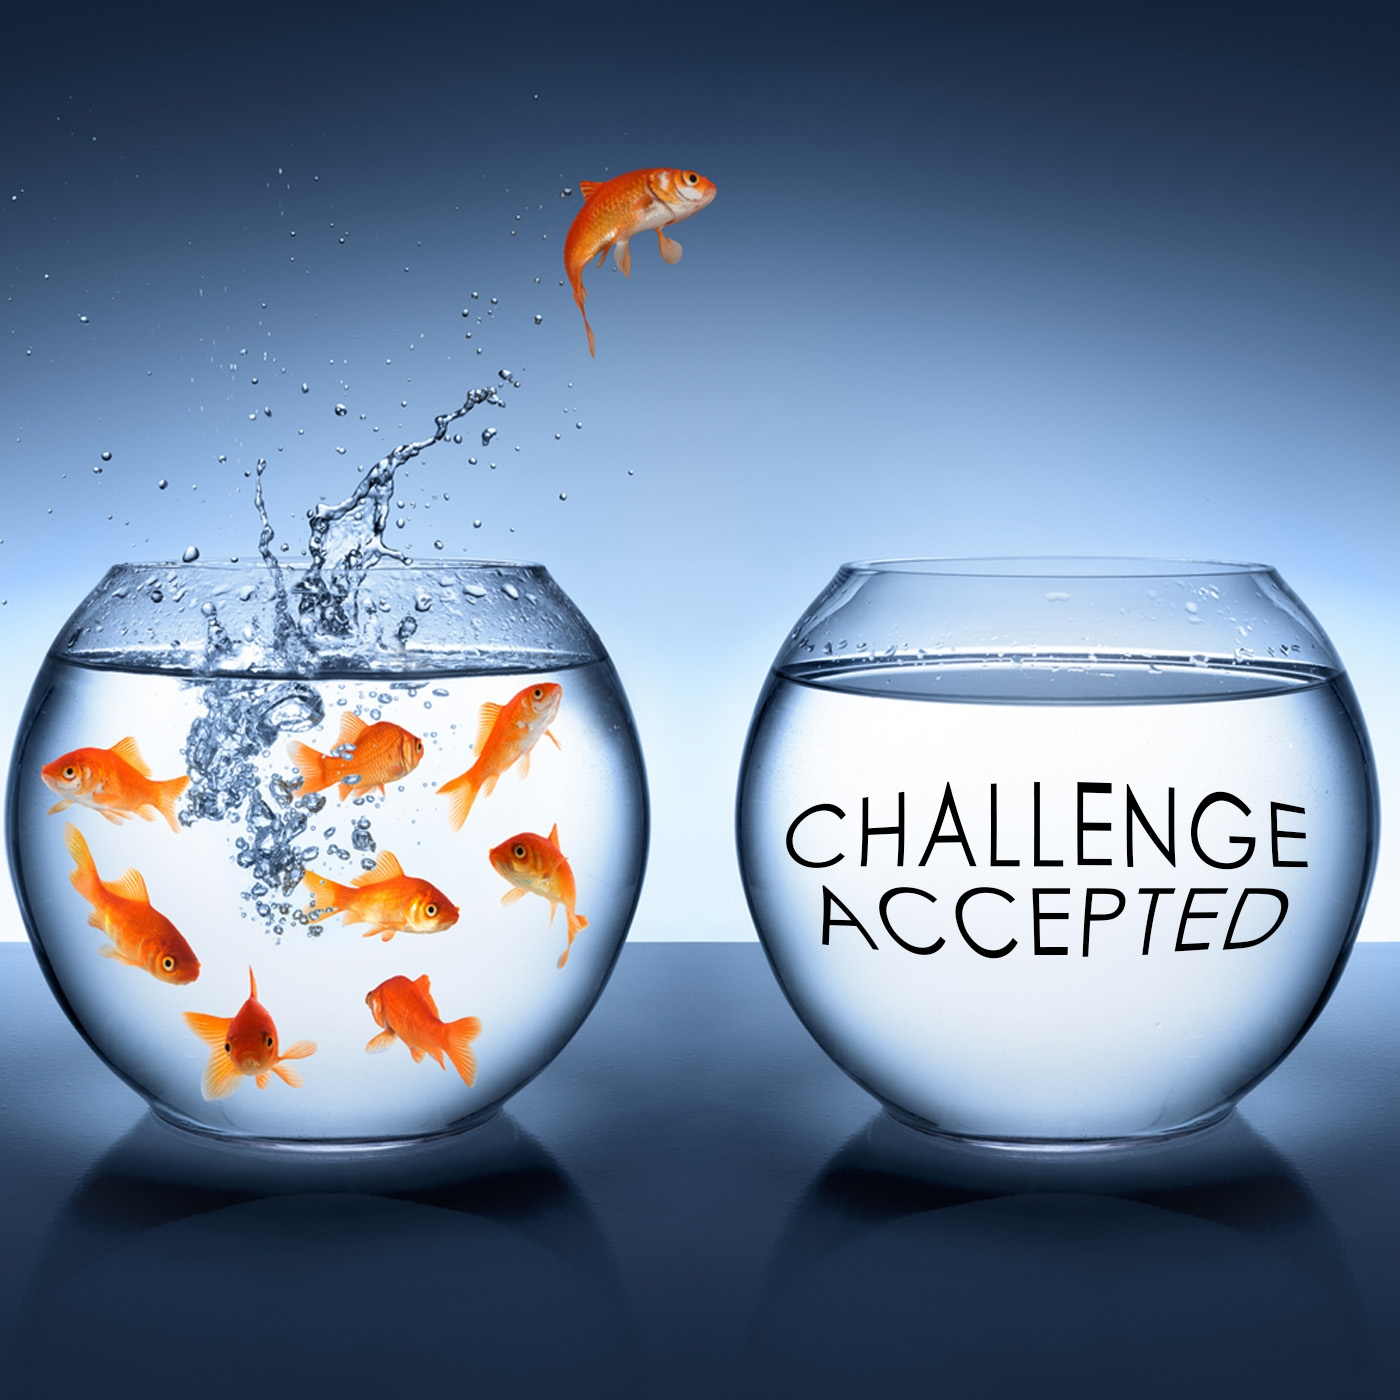 Take a New Challenge, Make a New Life